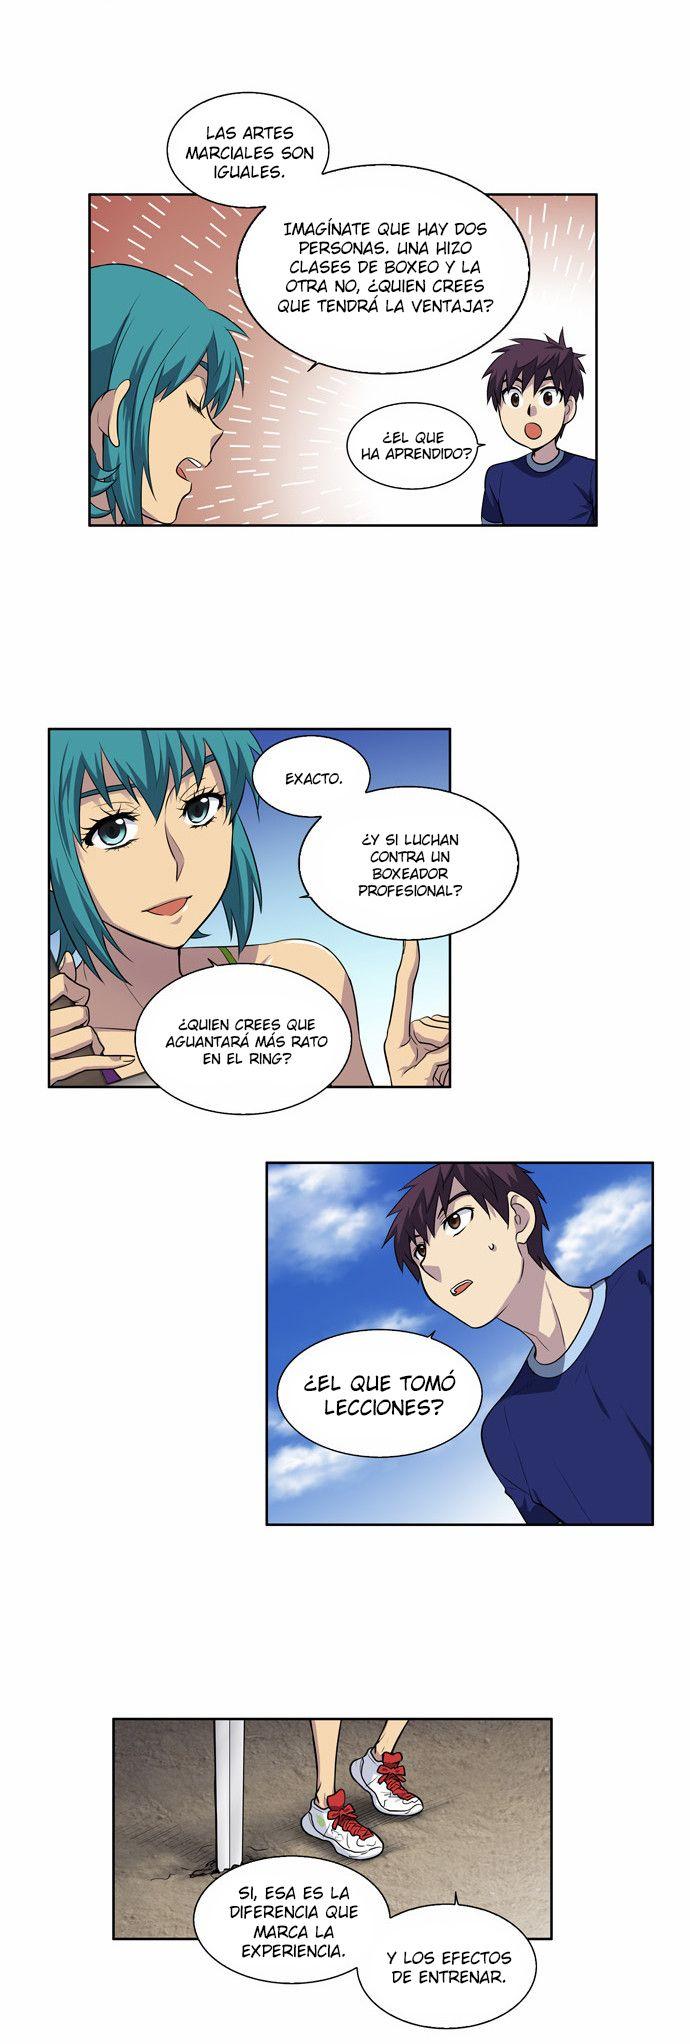 http://c5.ninemanga.com/es_manga/61/1725/464211/62dbdc10715d73b9fbbfdcda0a88848d.jpg Page 7